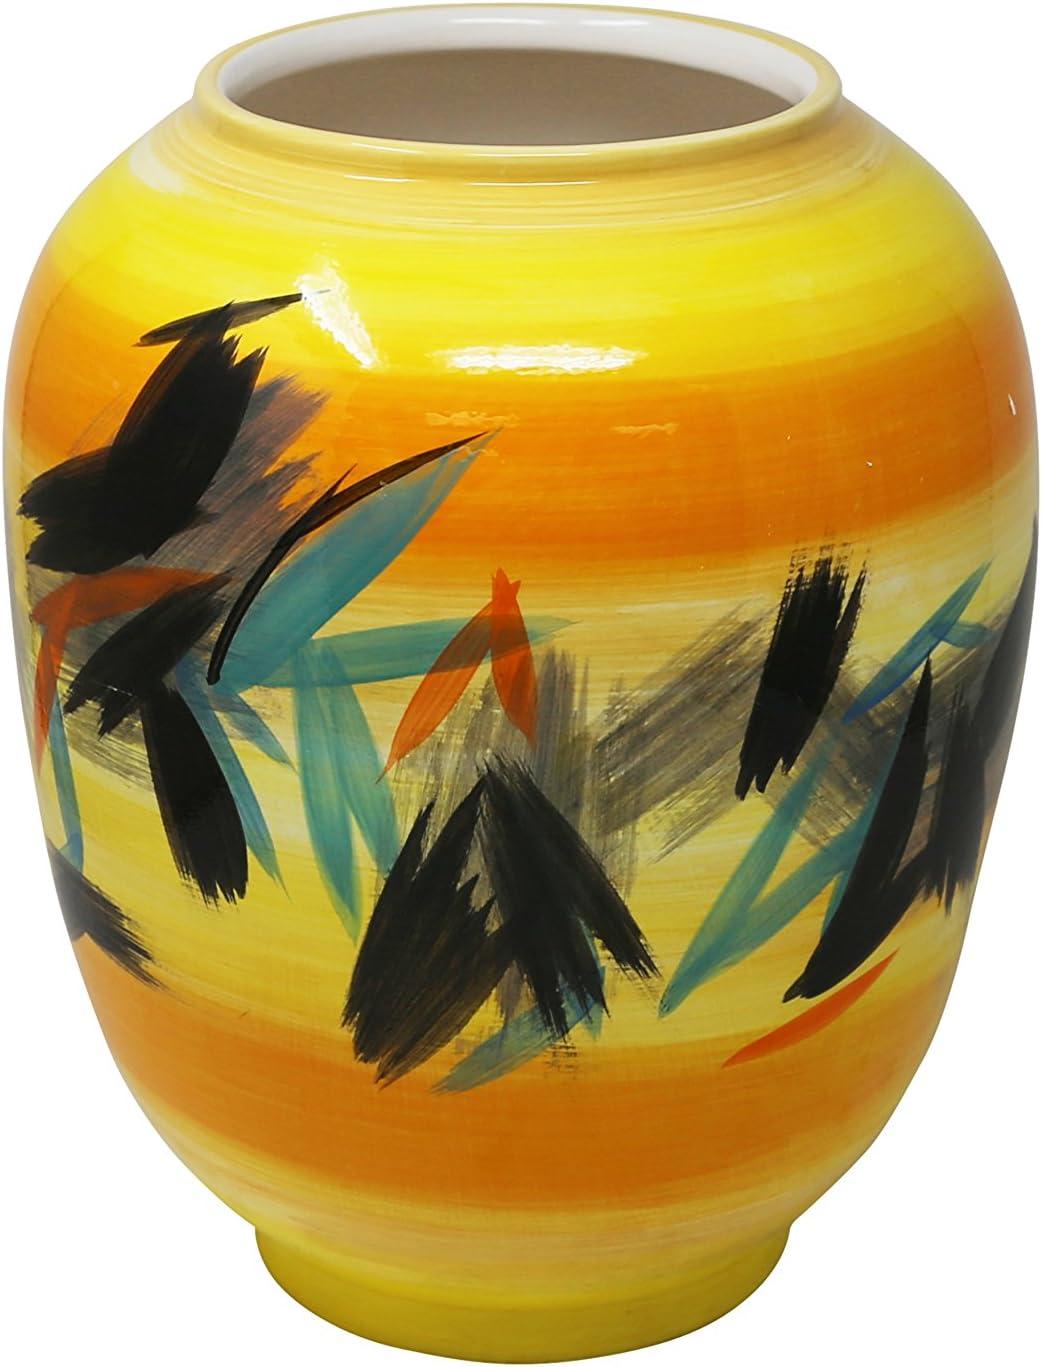 Sagebrook Home, Yellow Mix Decorative Ceramic Vase, 10.5